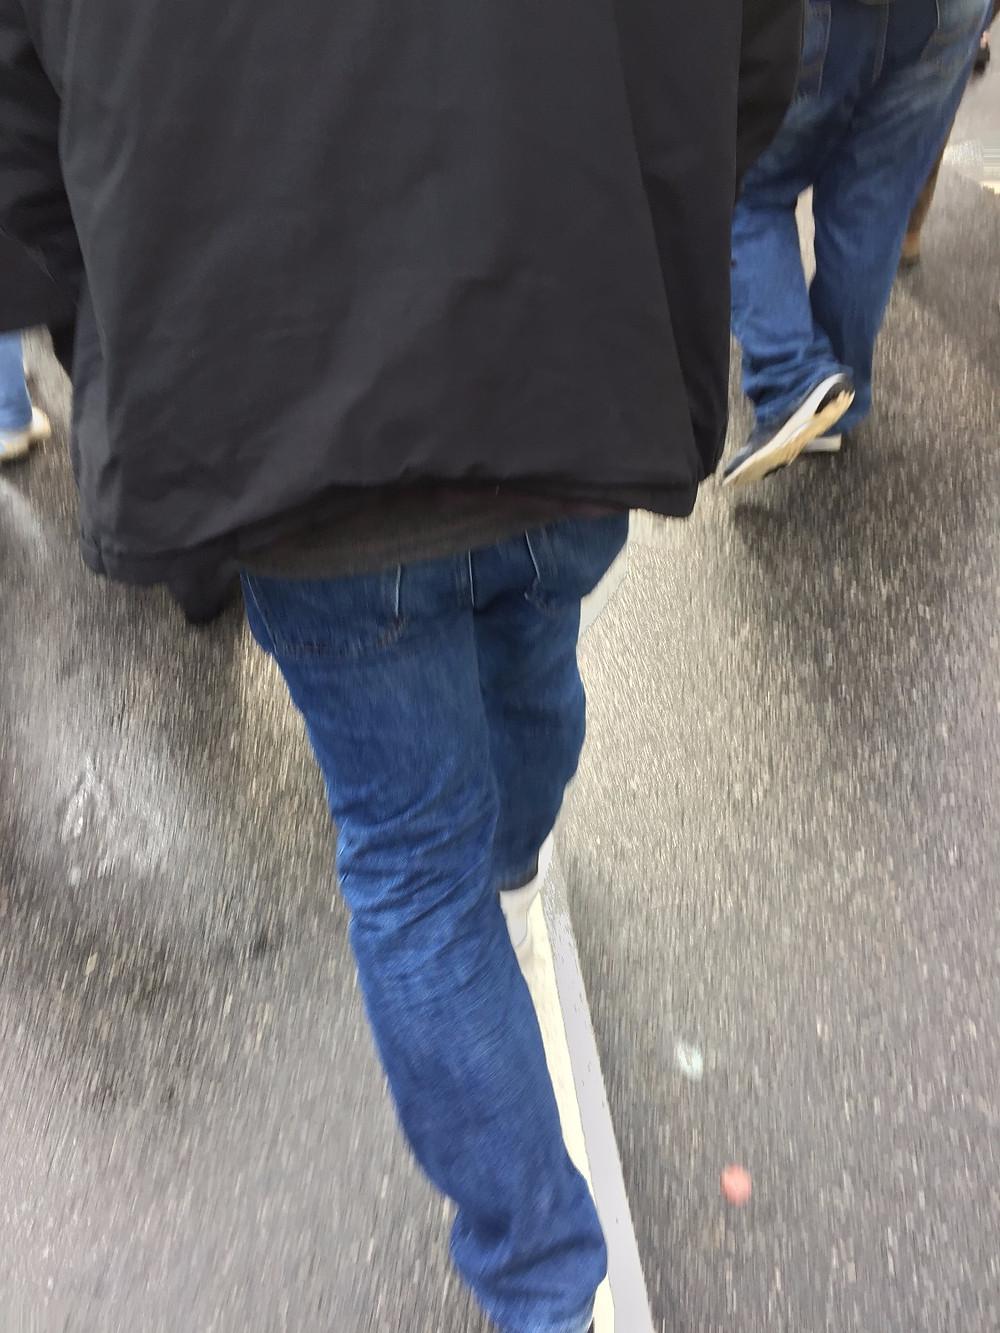 protesters' legs, Philadelphia, 1/26/17